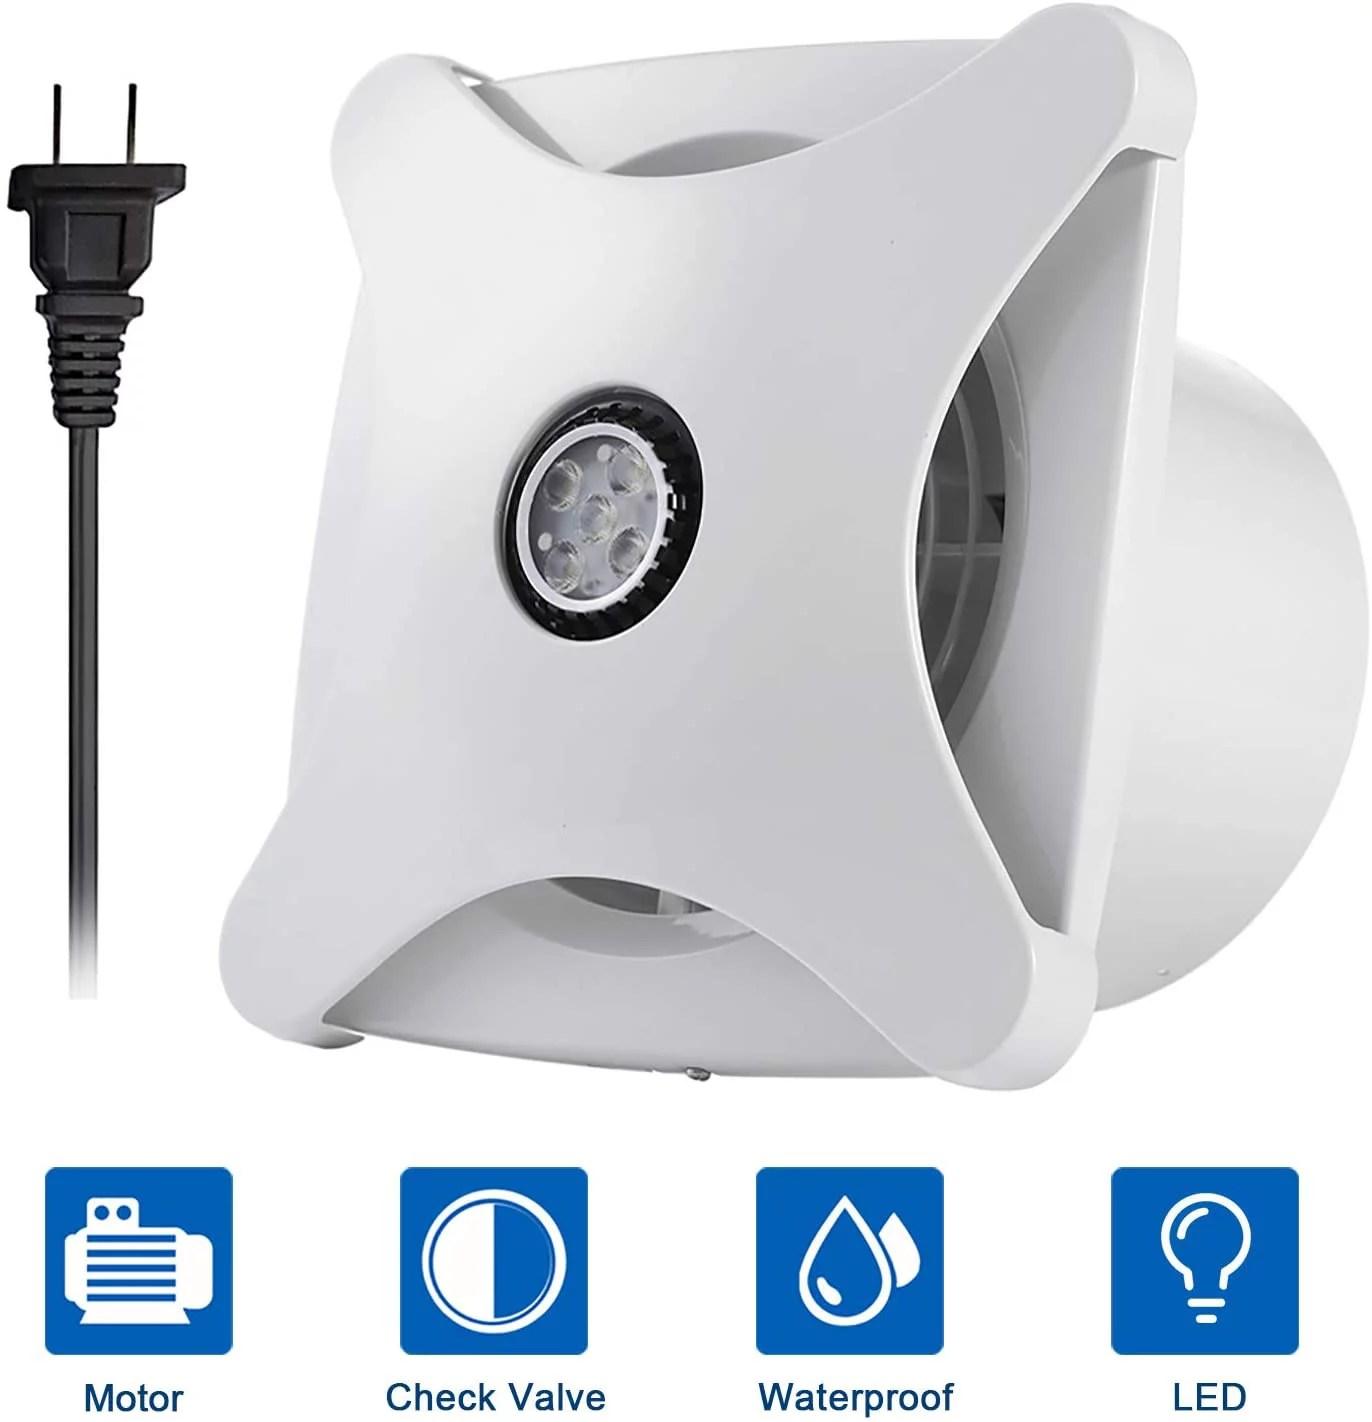 hon guan 6 home ventilation fan bathroom garage exhaust fan ceiling and wall mount fan for kitchen bathroom super